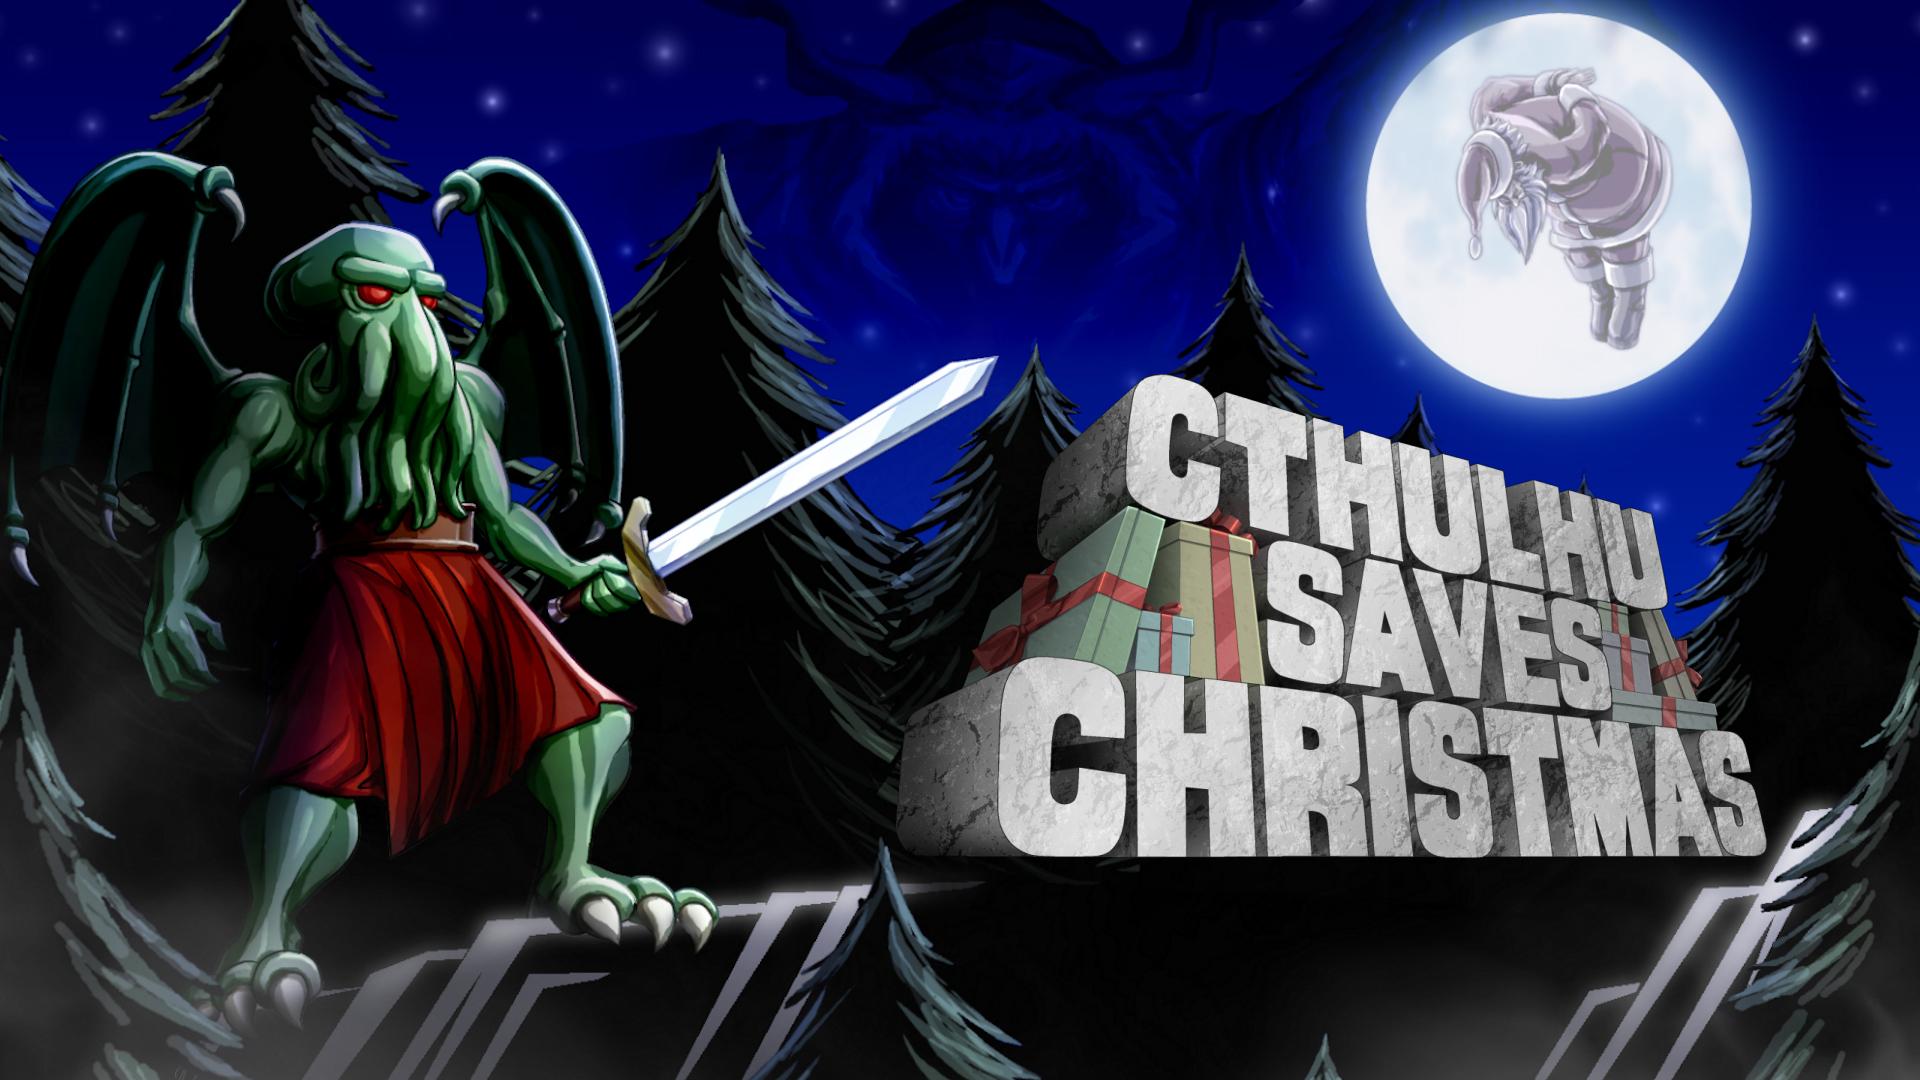 Постер Cthulhu Saves Christmas